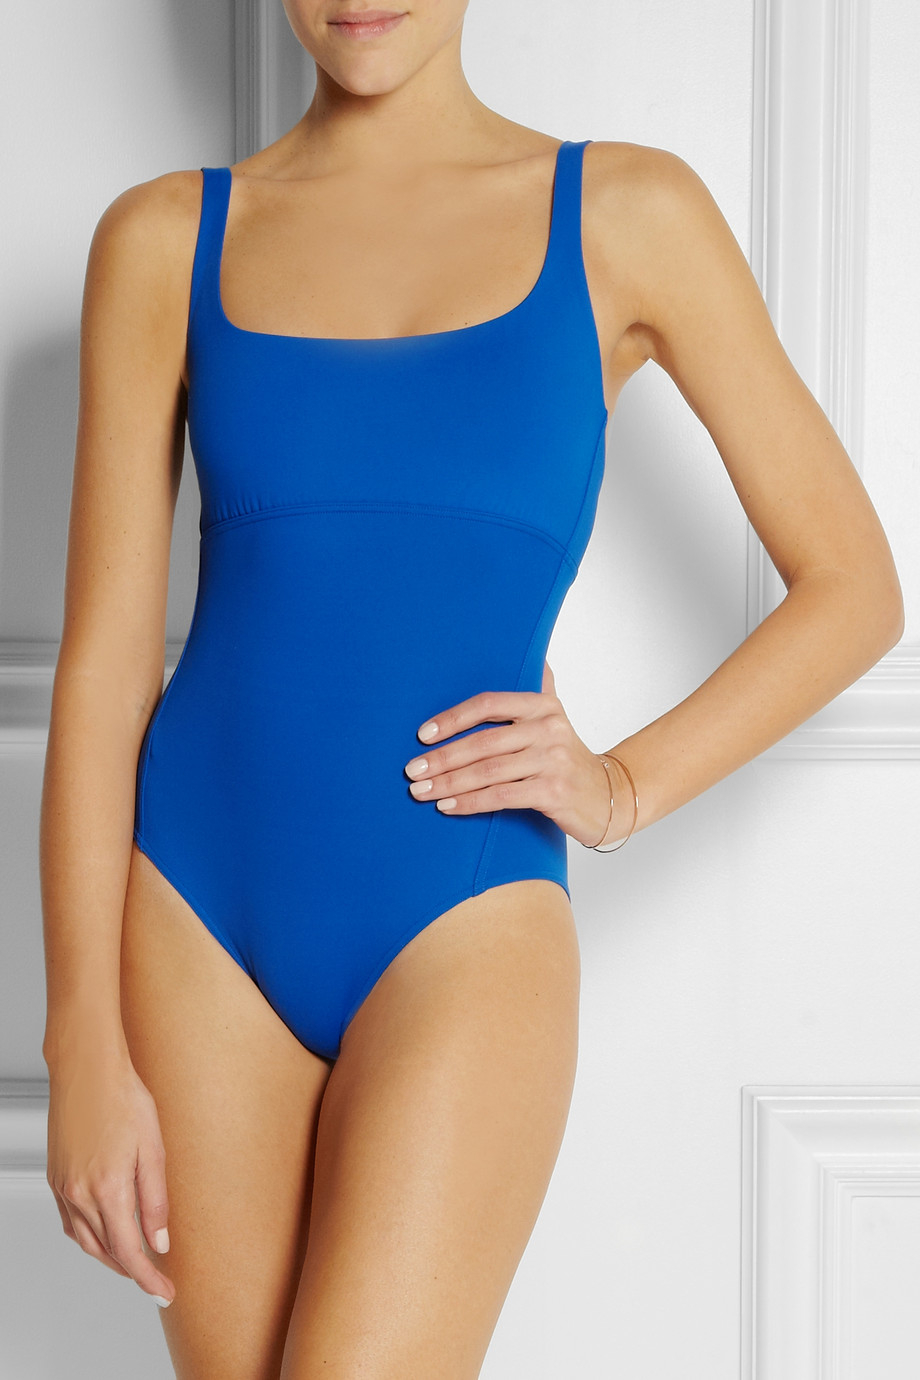 Lyst - Eres Les Essentiels Arnaque Swimsuit in Blue